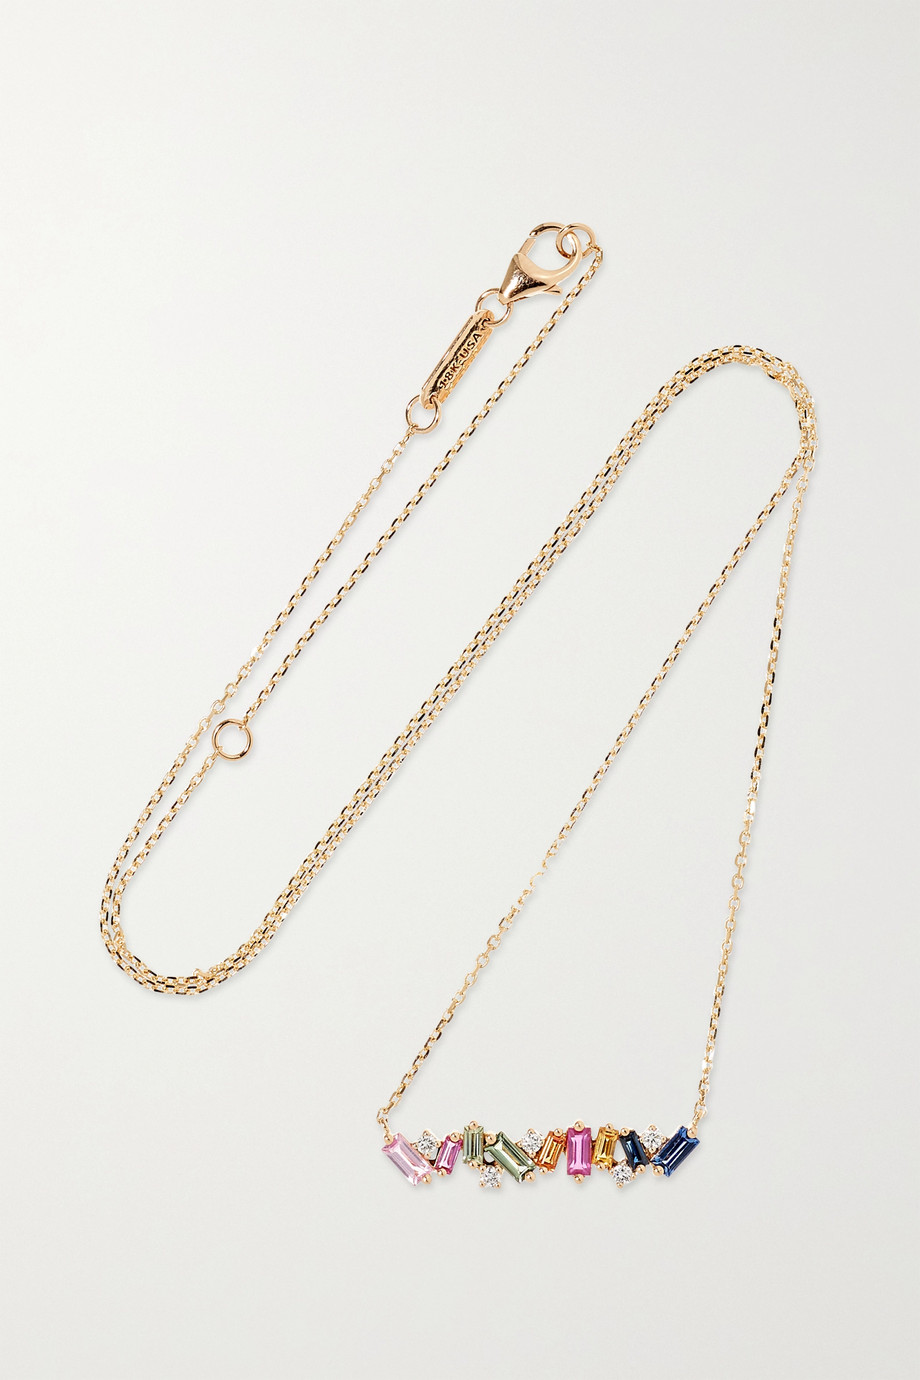 Suzanne Kalan 18K 玫瑰金、蓝宝石、钻石项链